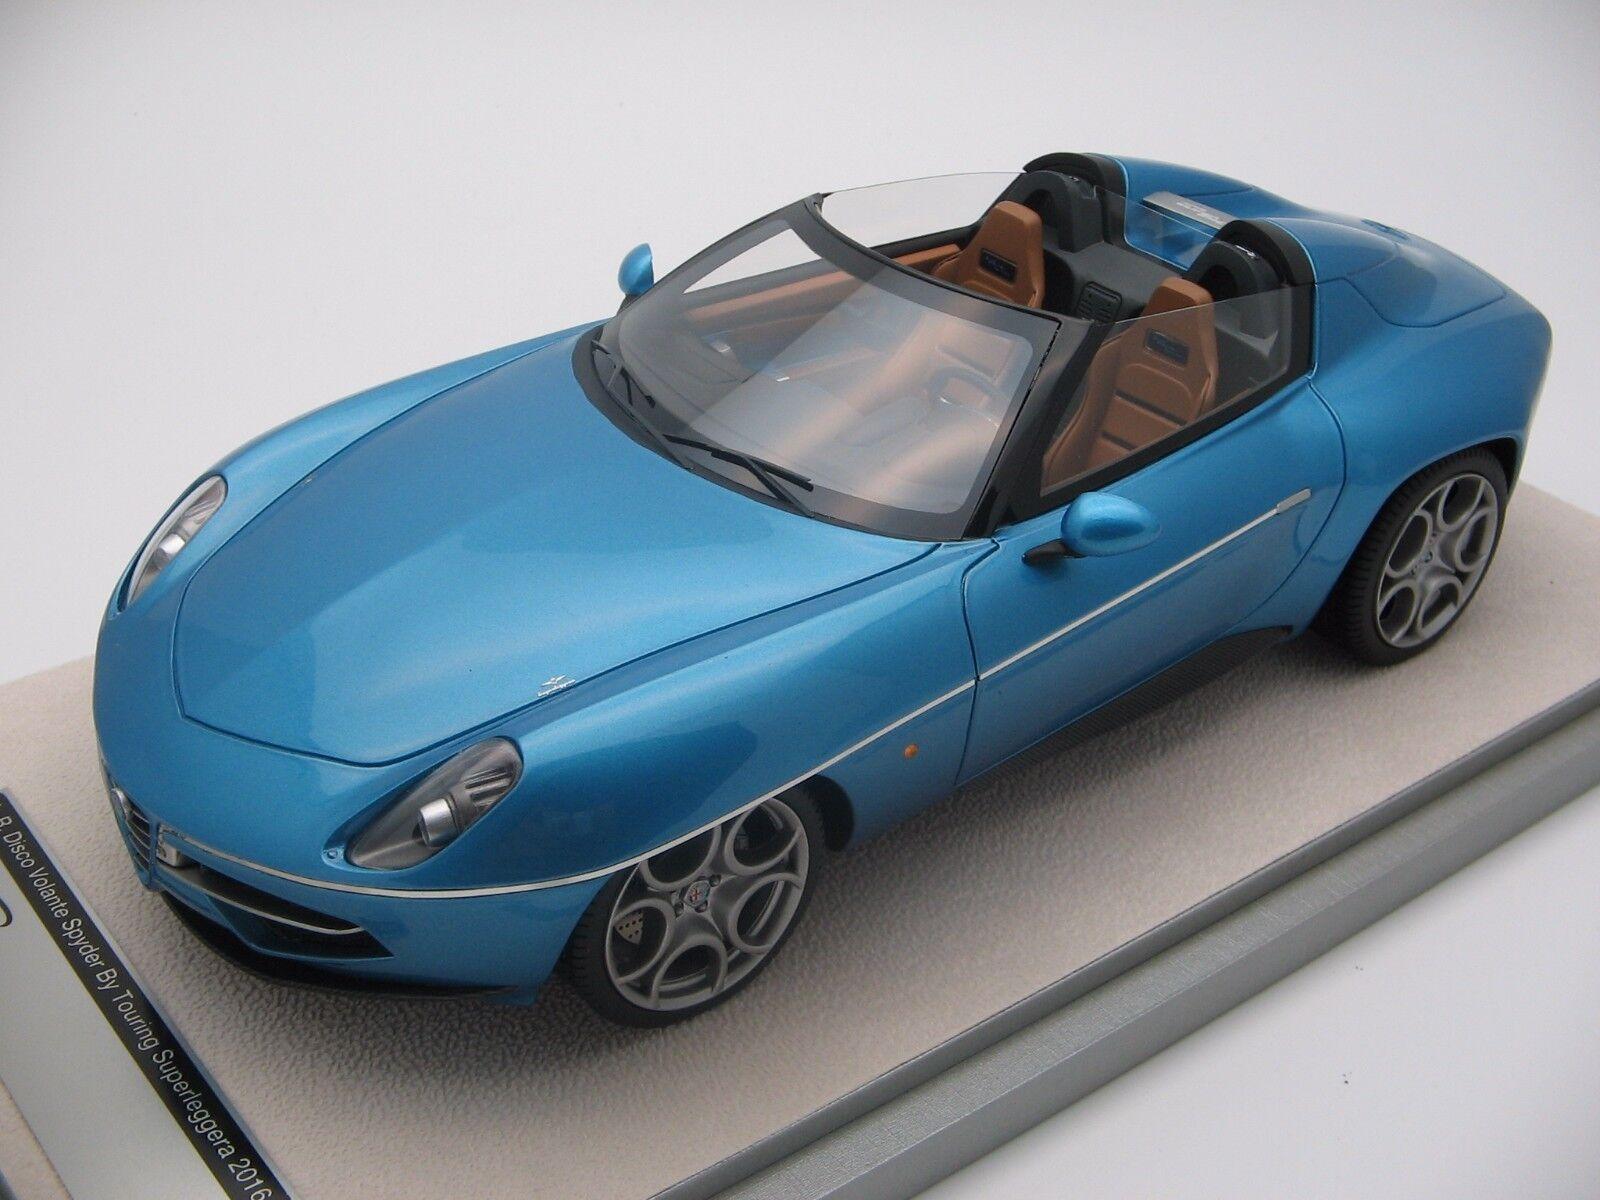 1 18 Scale Tecnomodel Alfa Romeo Disco Volante Spyder by Touring tm18-68b